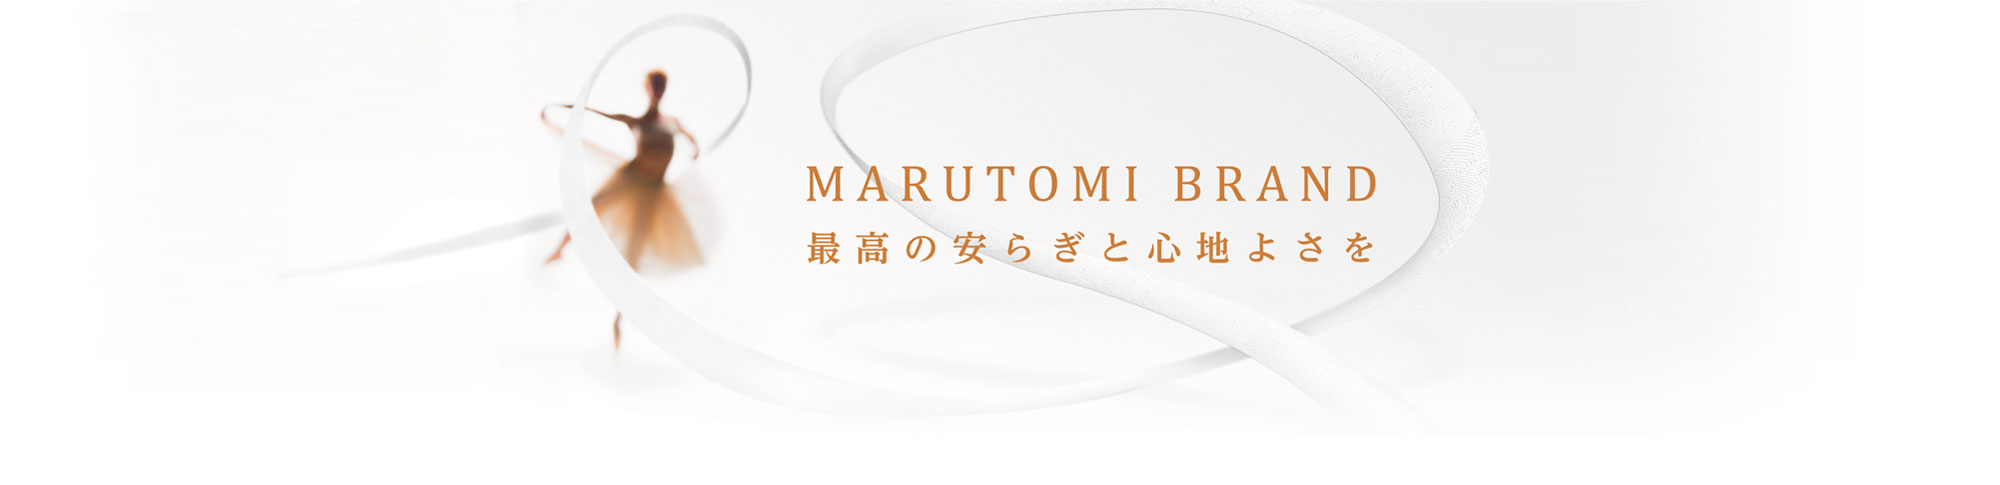 MARUTOMI BRAND 最高の安らぎと心地よさを